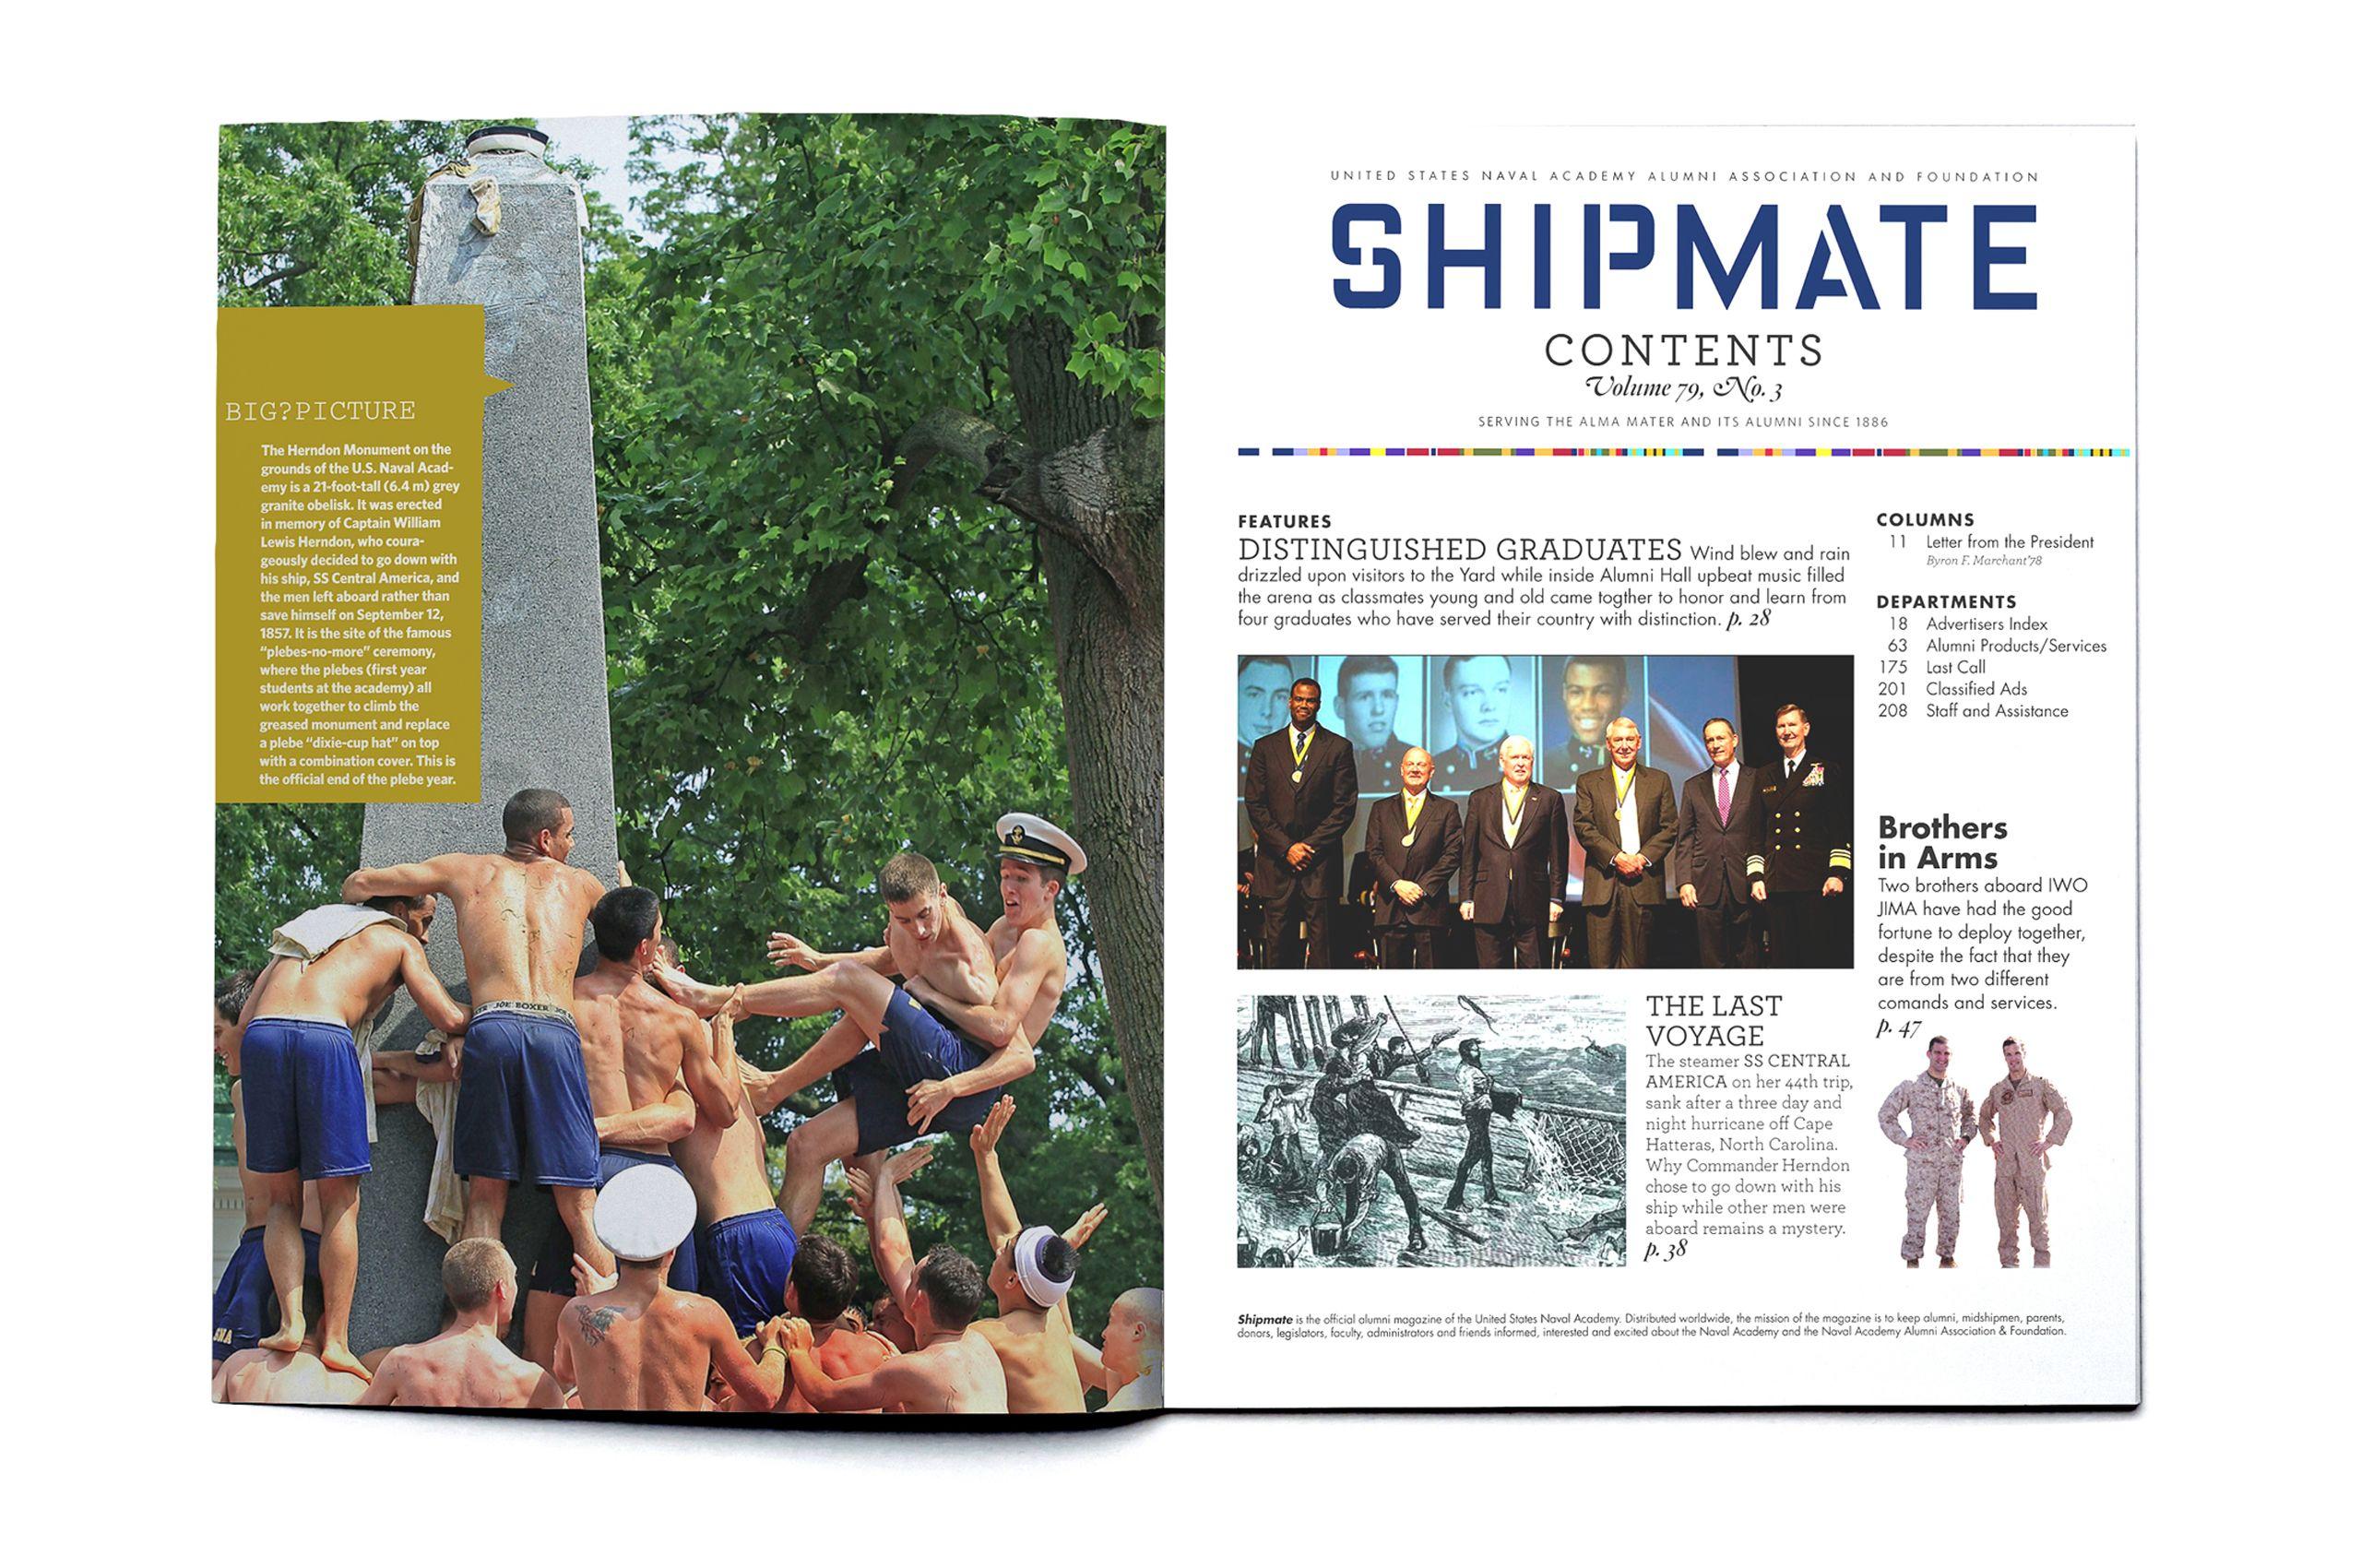 SHIPMATE SPREAD.jpg